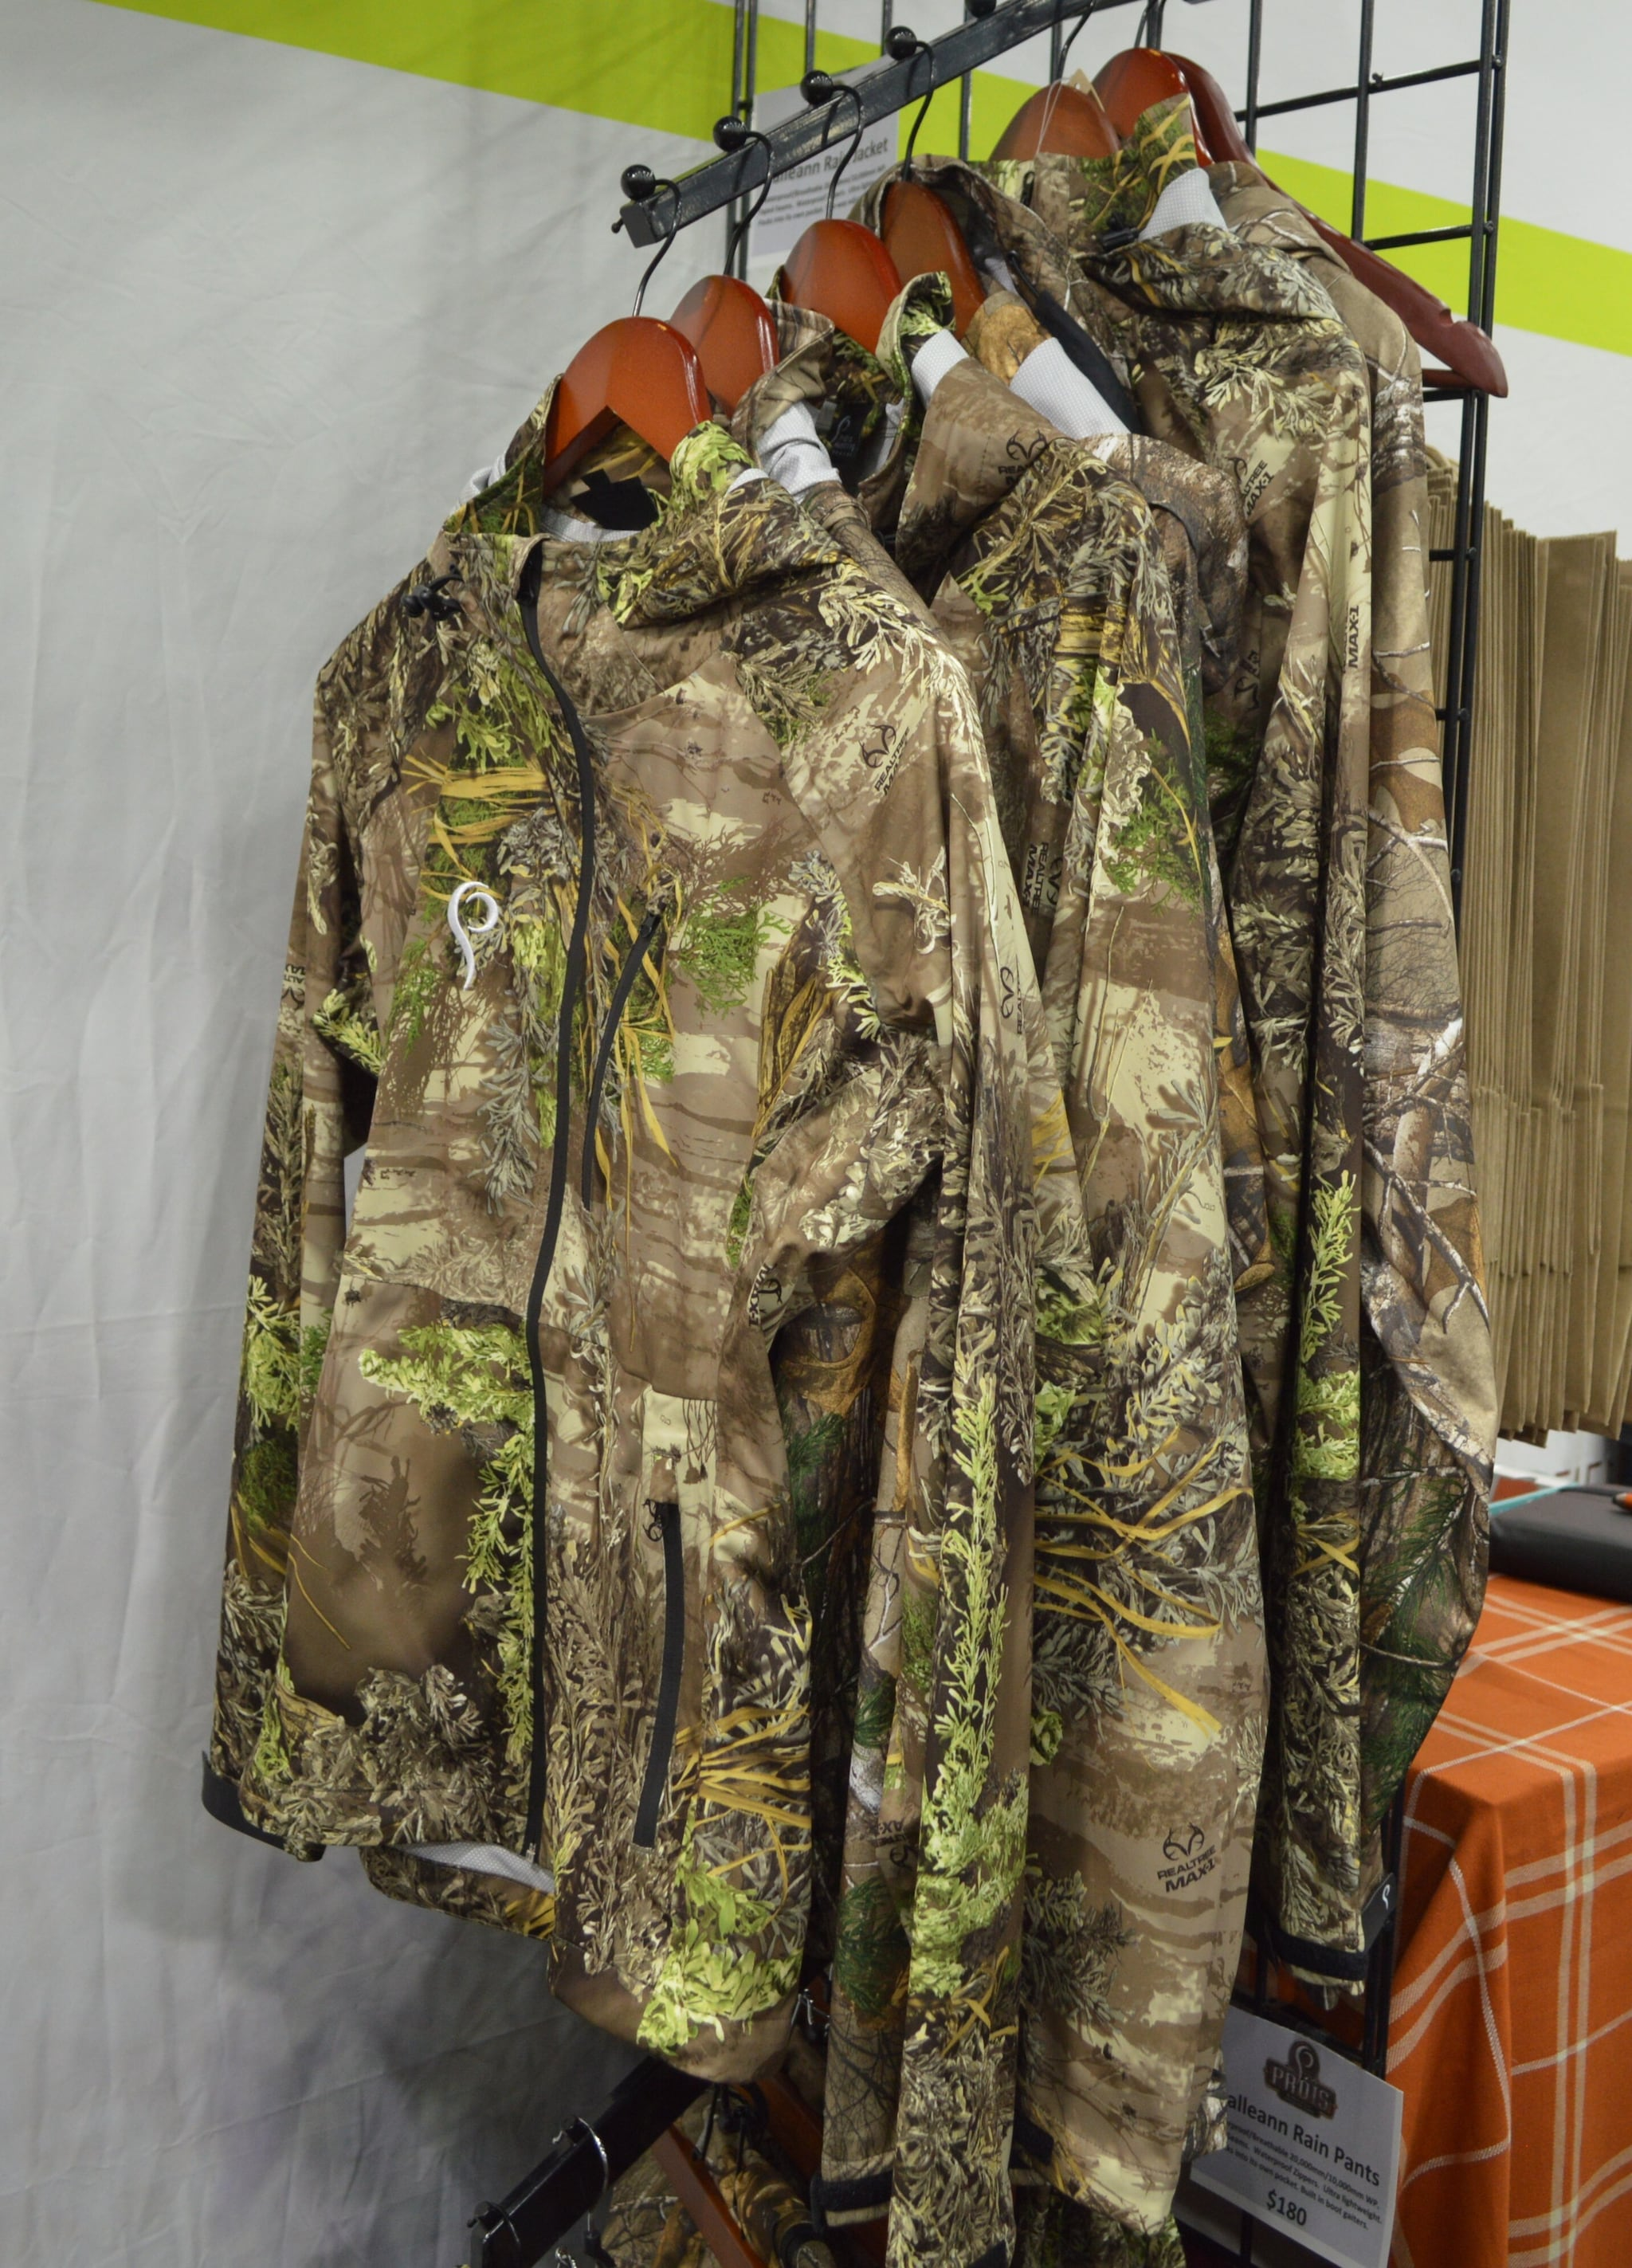 The Prois Galleann waterproof, breathable, lightweight rainjacket that packs into its own pocket. (Photo: Kristin Alberts/Guns.com)